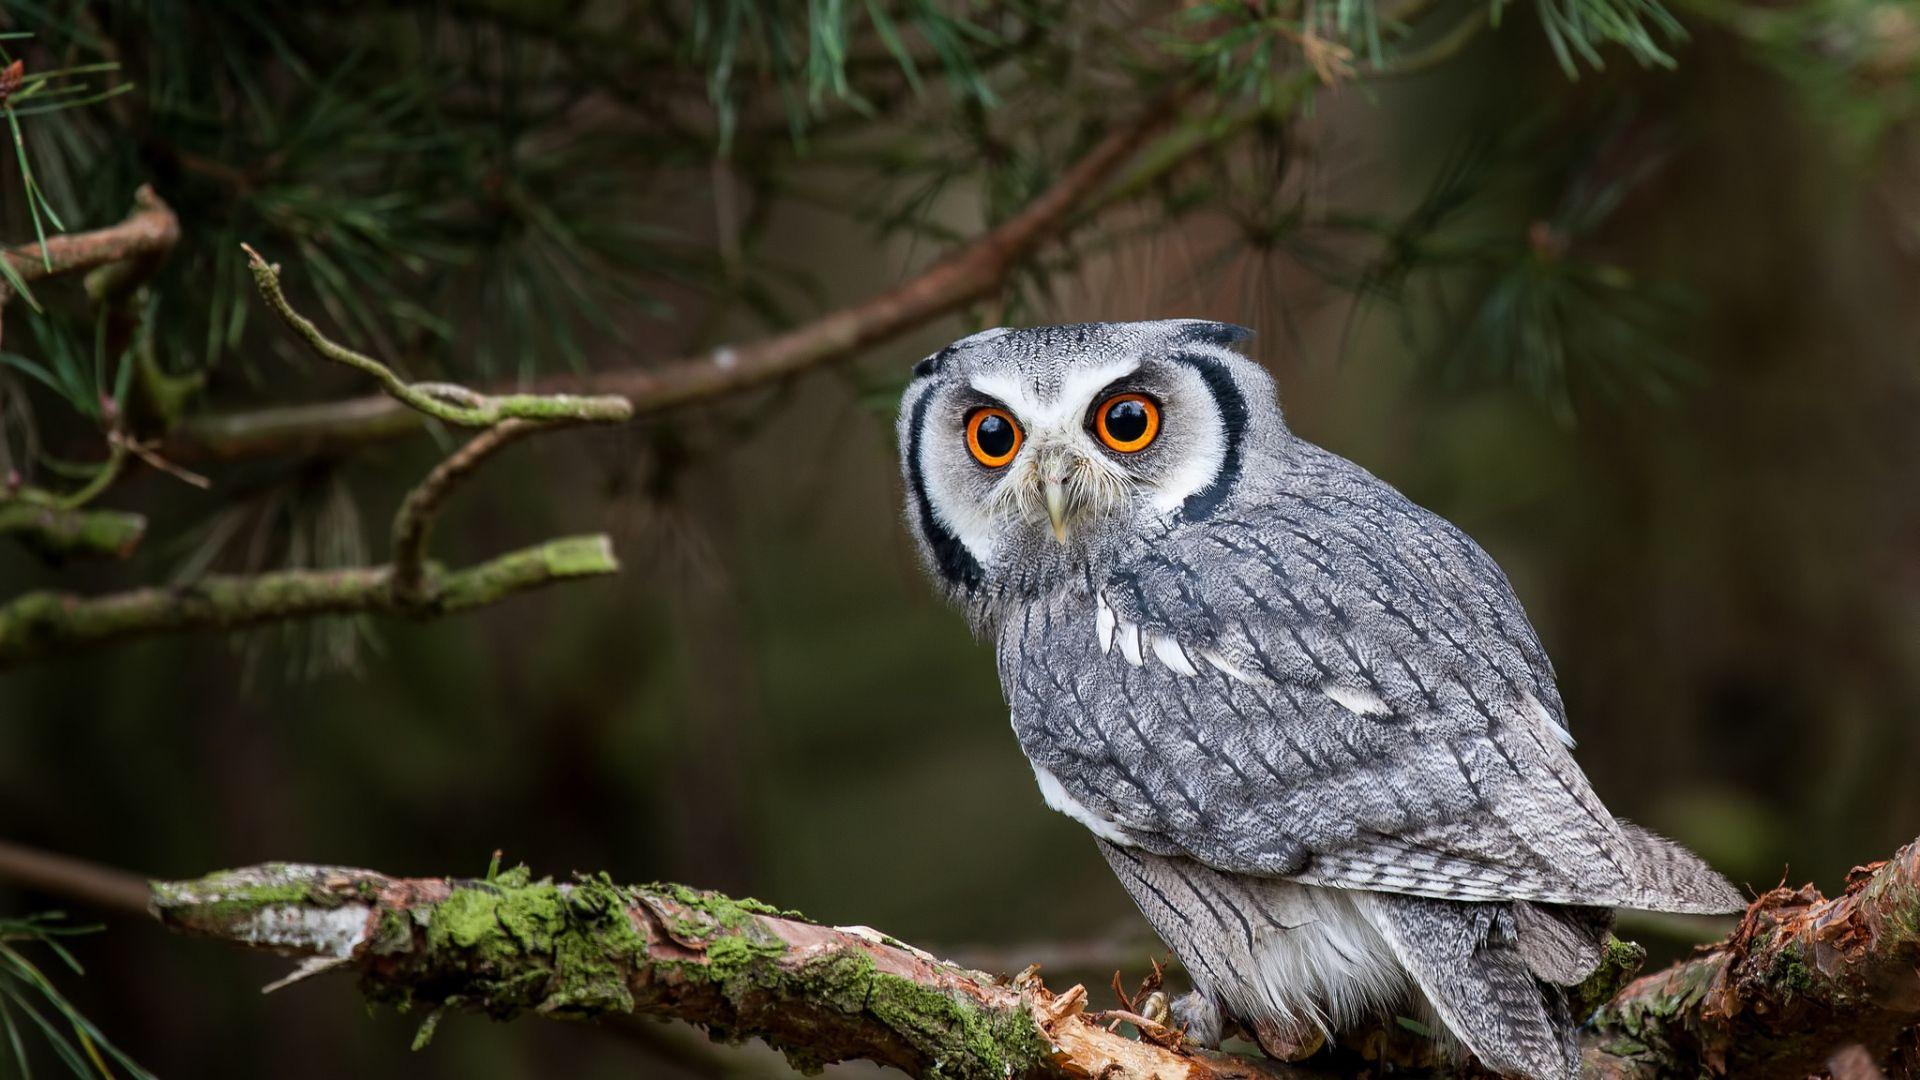 Wallpaper owl predator branch forest 1920x1080 | Обои-совы ...